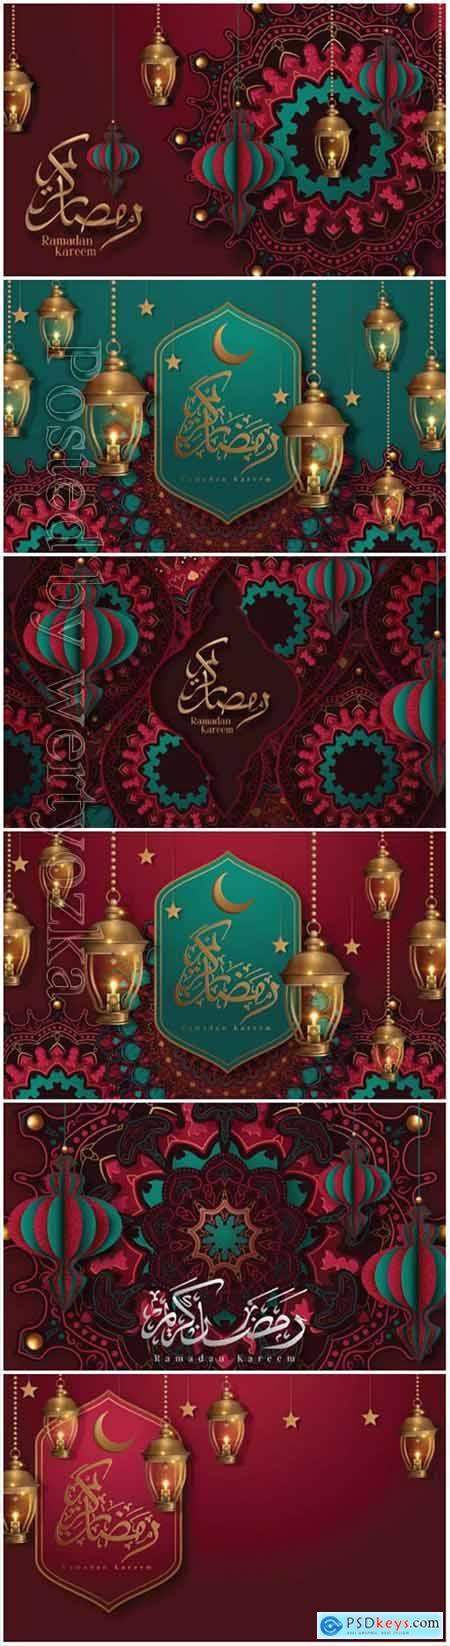 Ramadan kareem calligraphy card with arabesque flowers